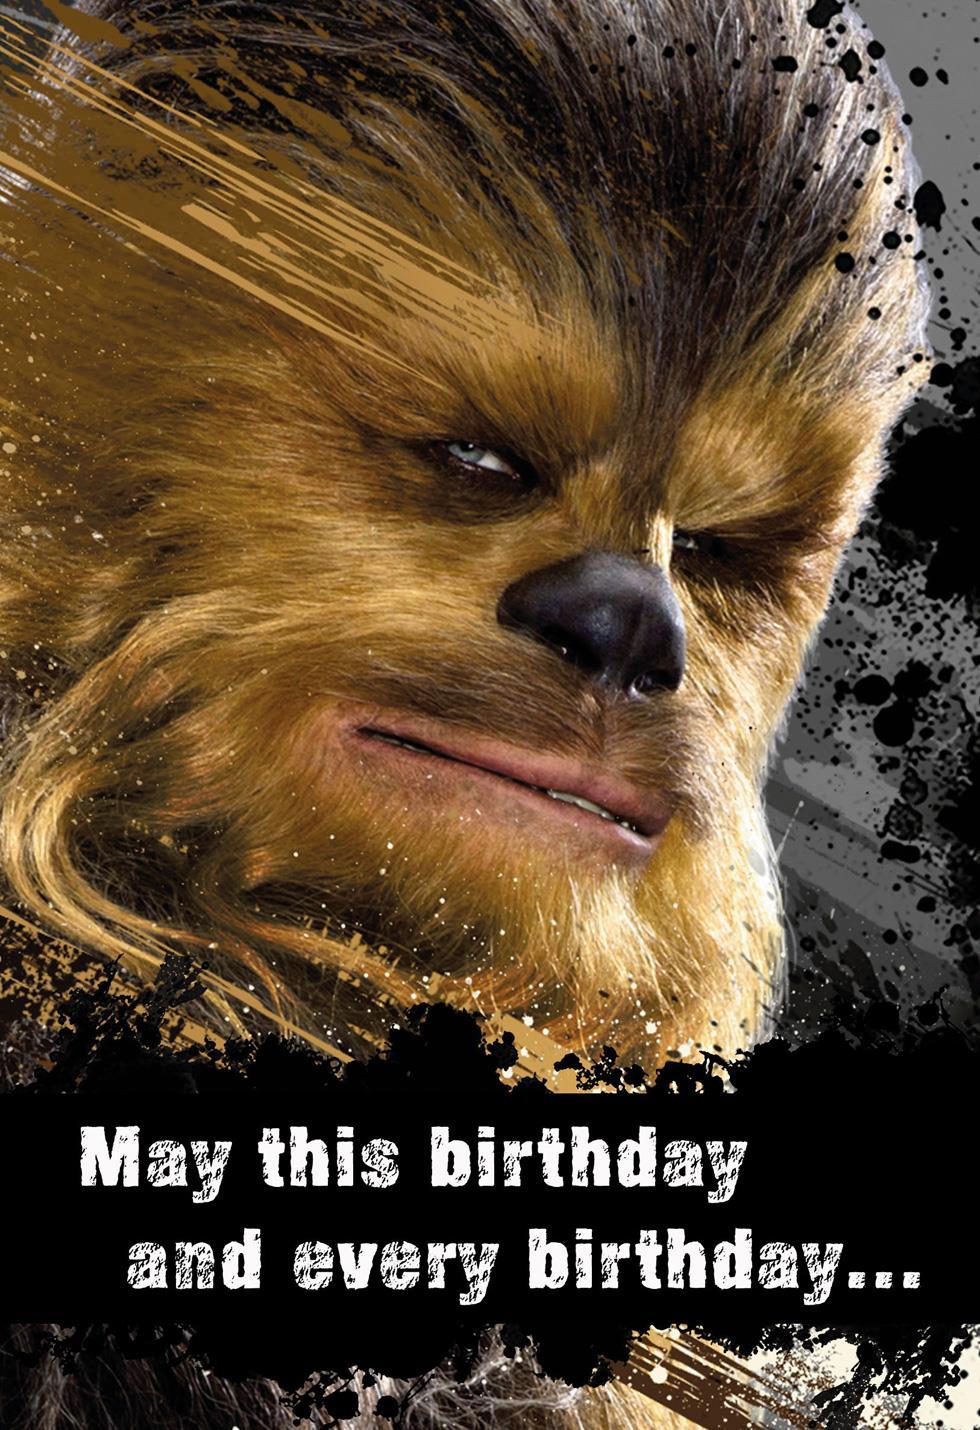 Star Wars Chewbacca Good Hair Day Birthday Sound Card